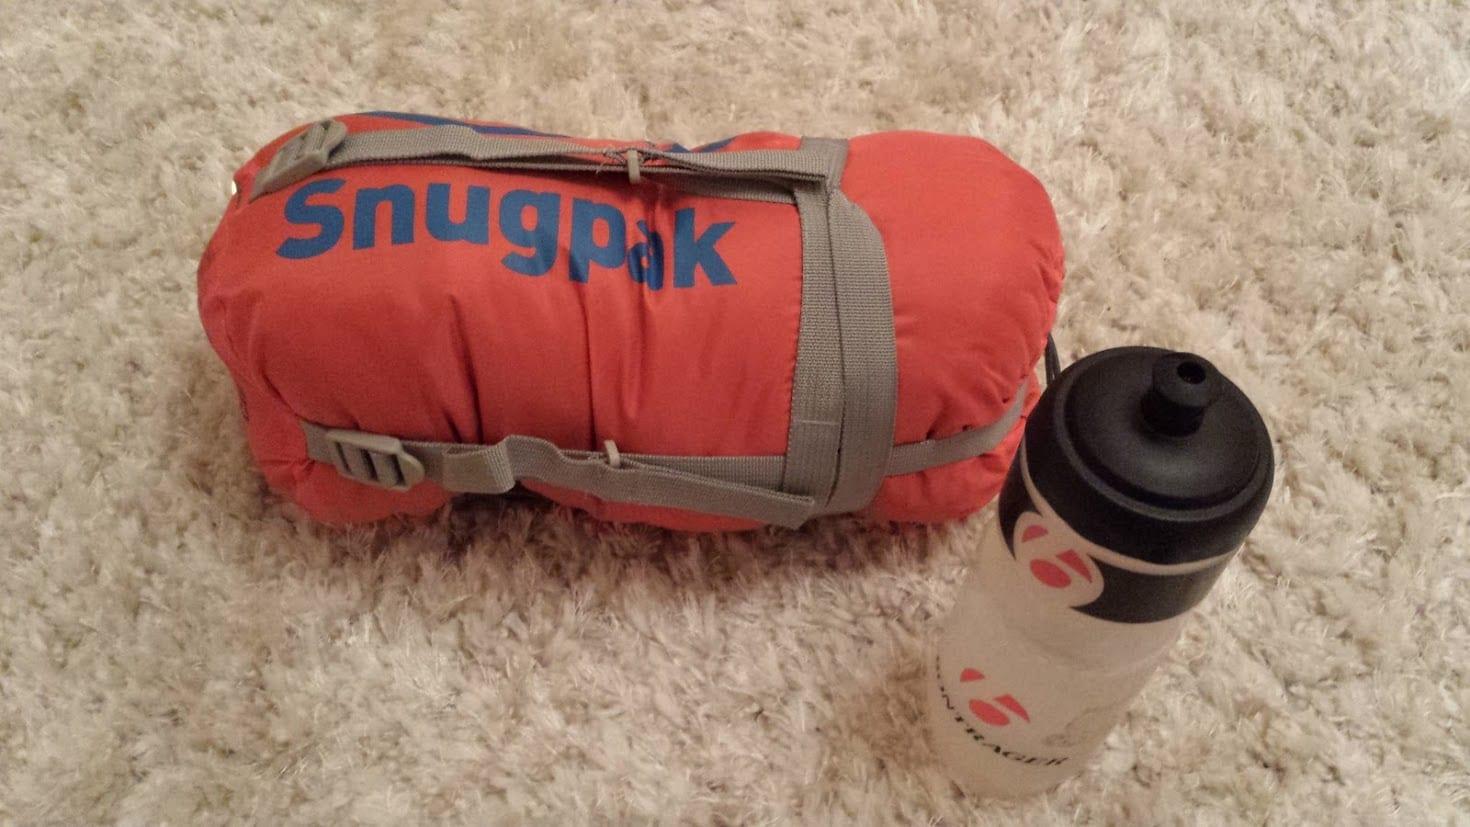 Snugpaksleeping bag for bike touring